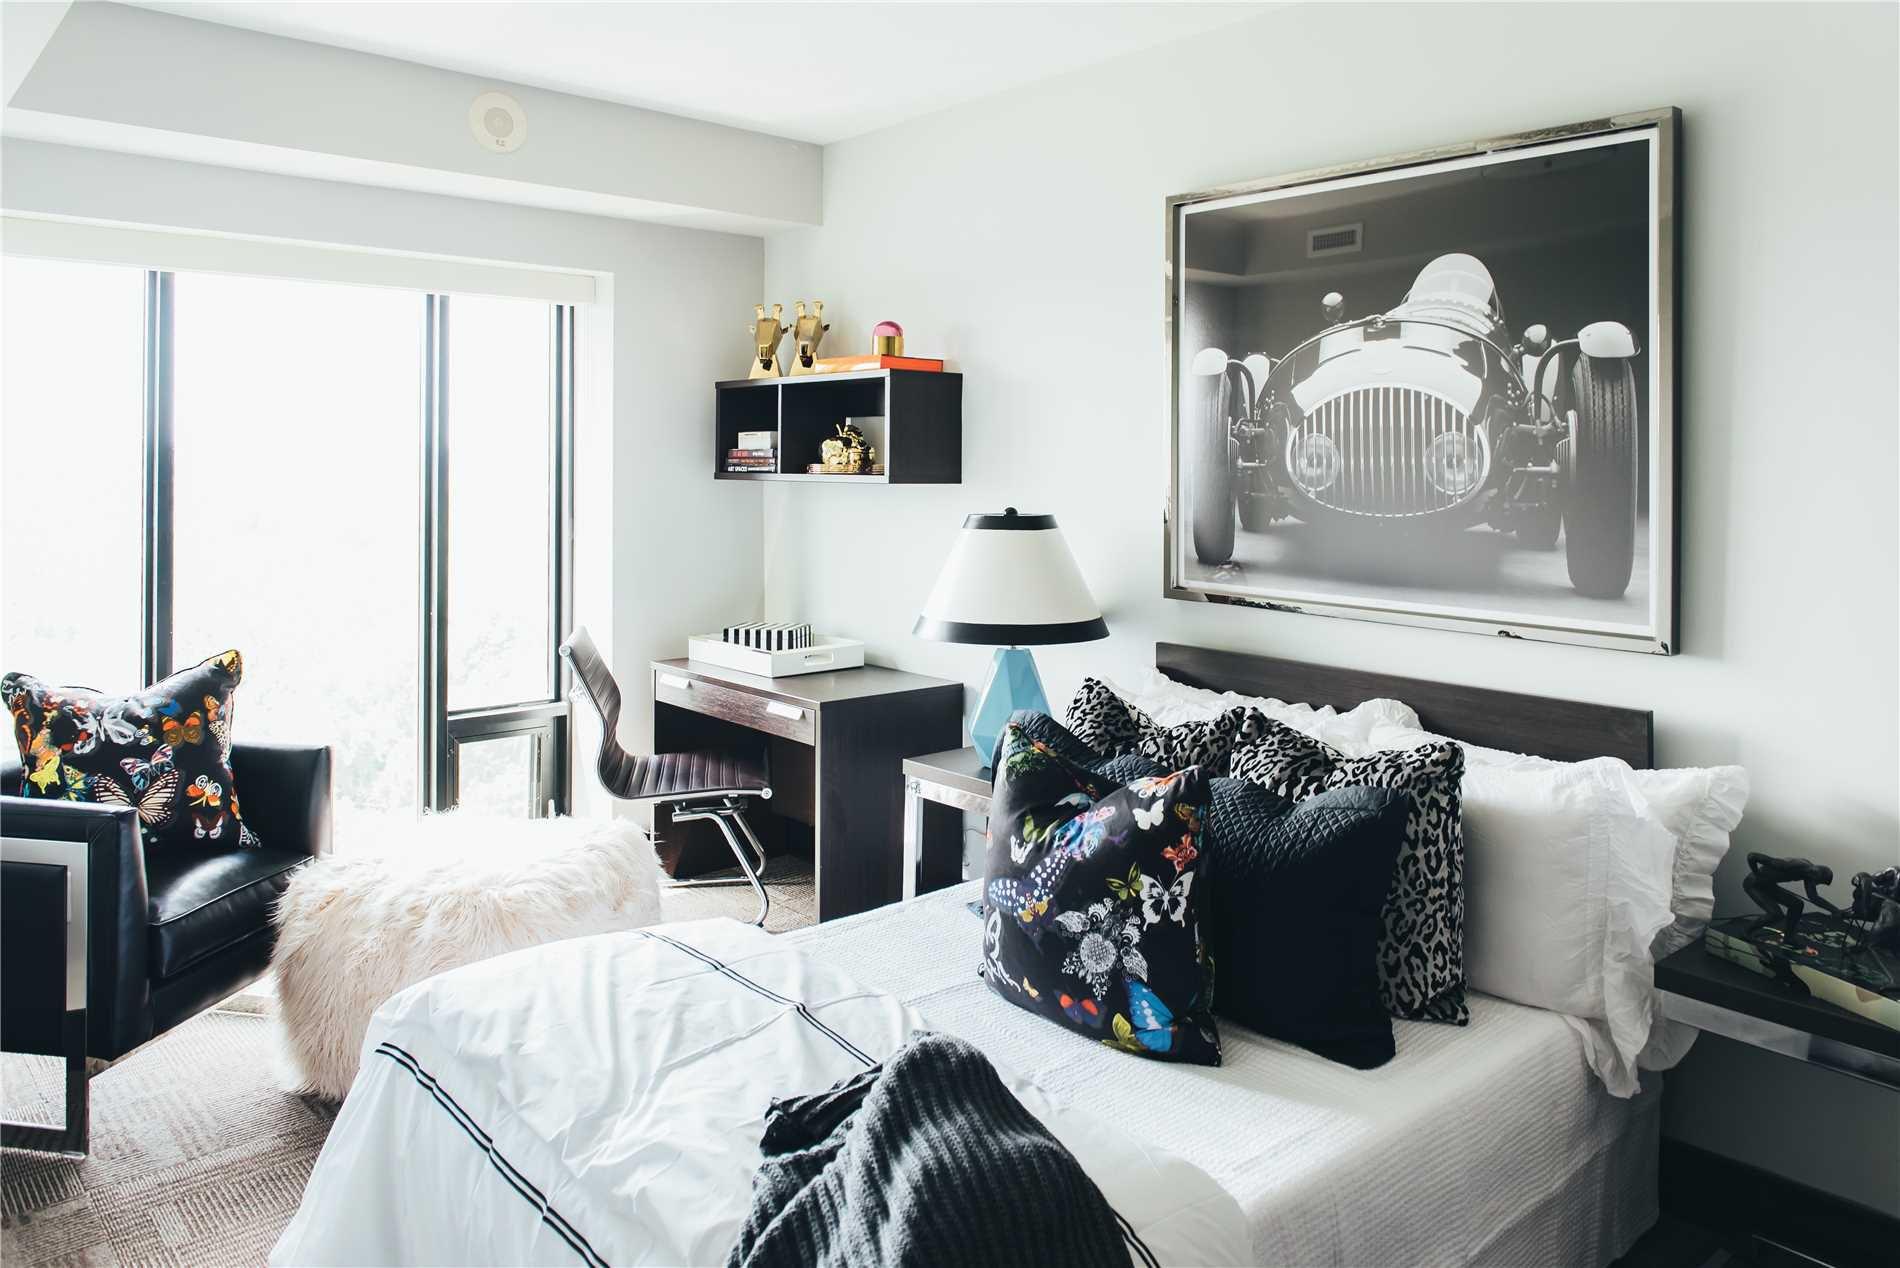 Photo 5: Photos: 407 1235 Richmond Street in London: Condo for sale : MLS®# X4335333